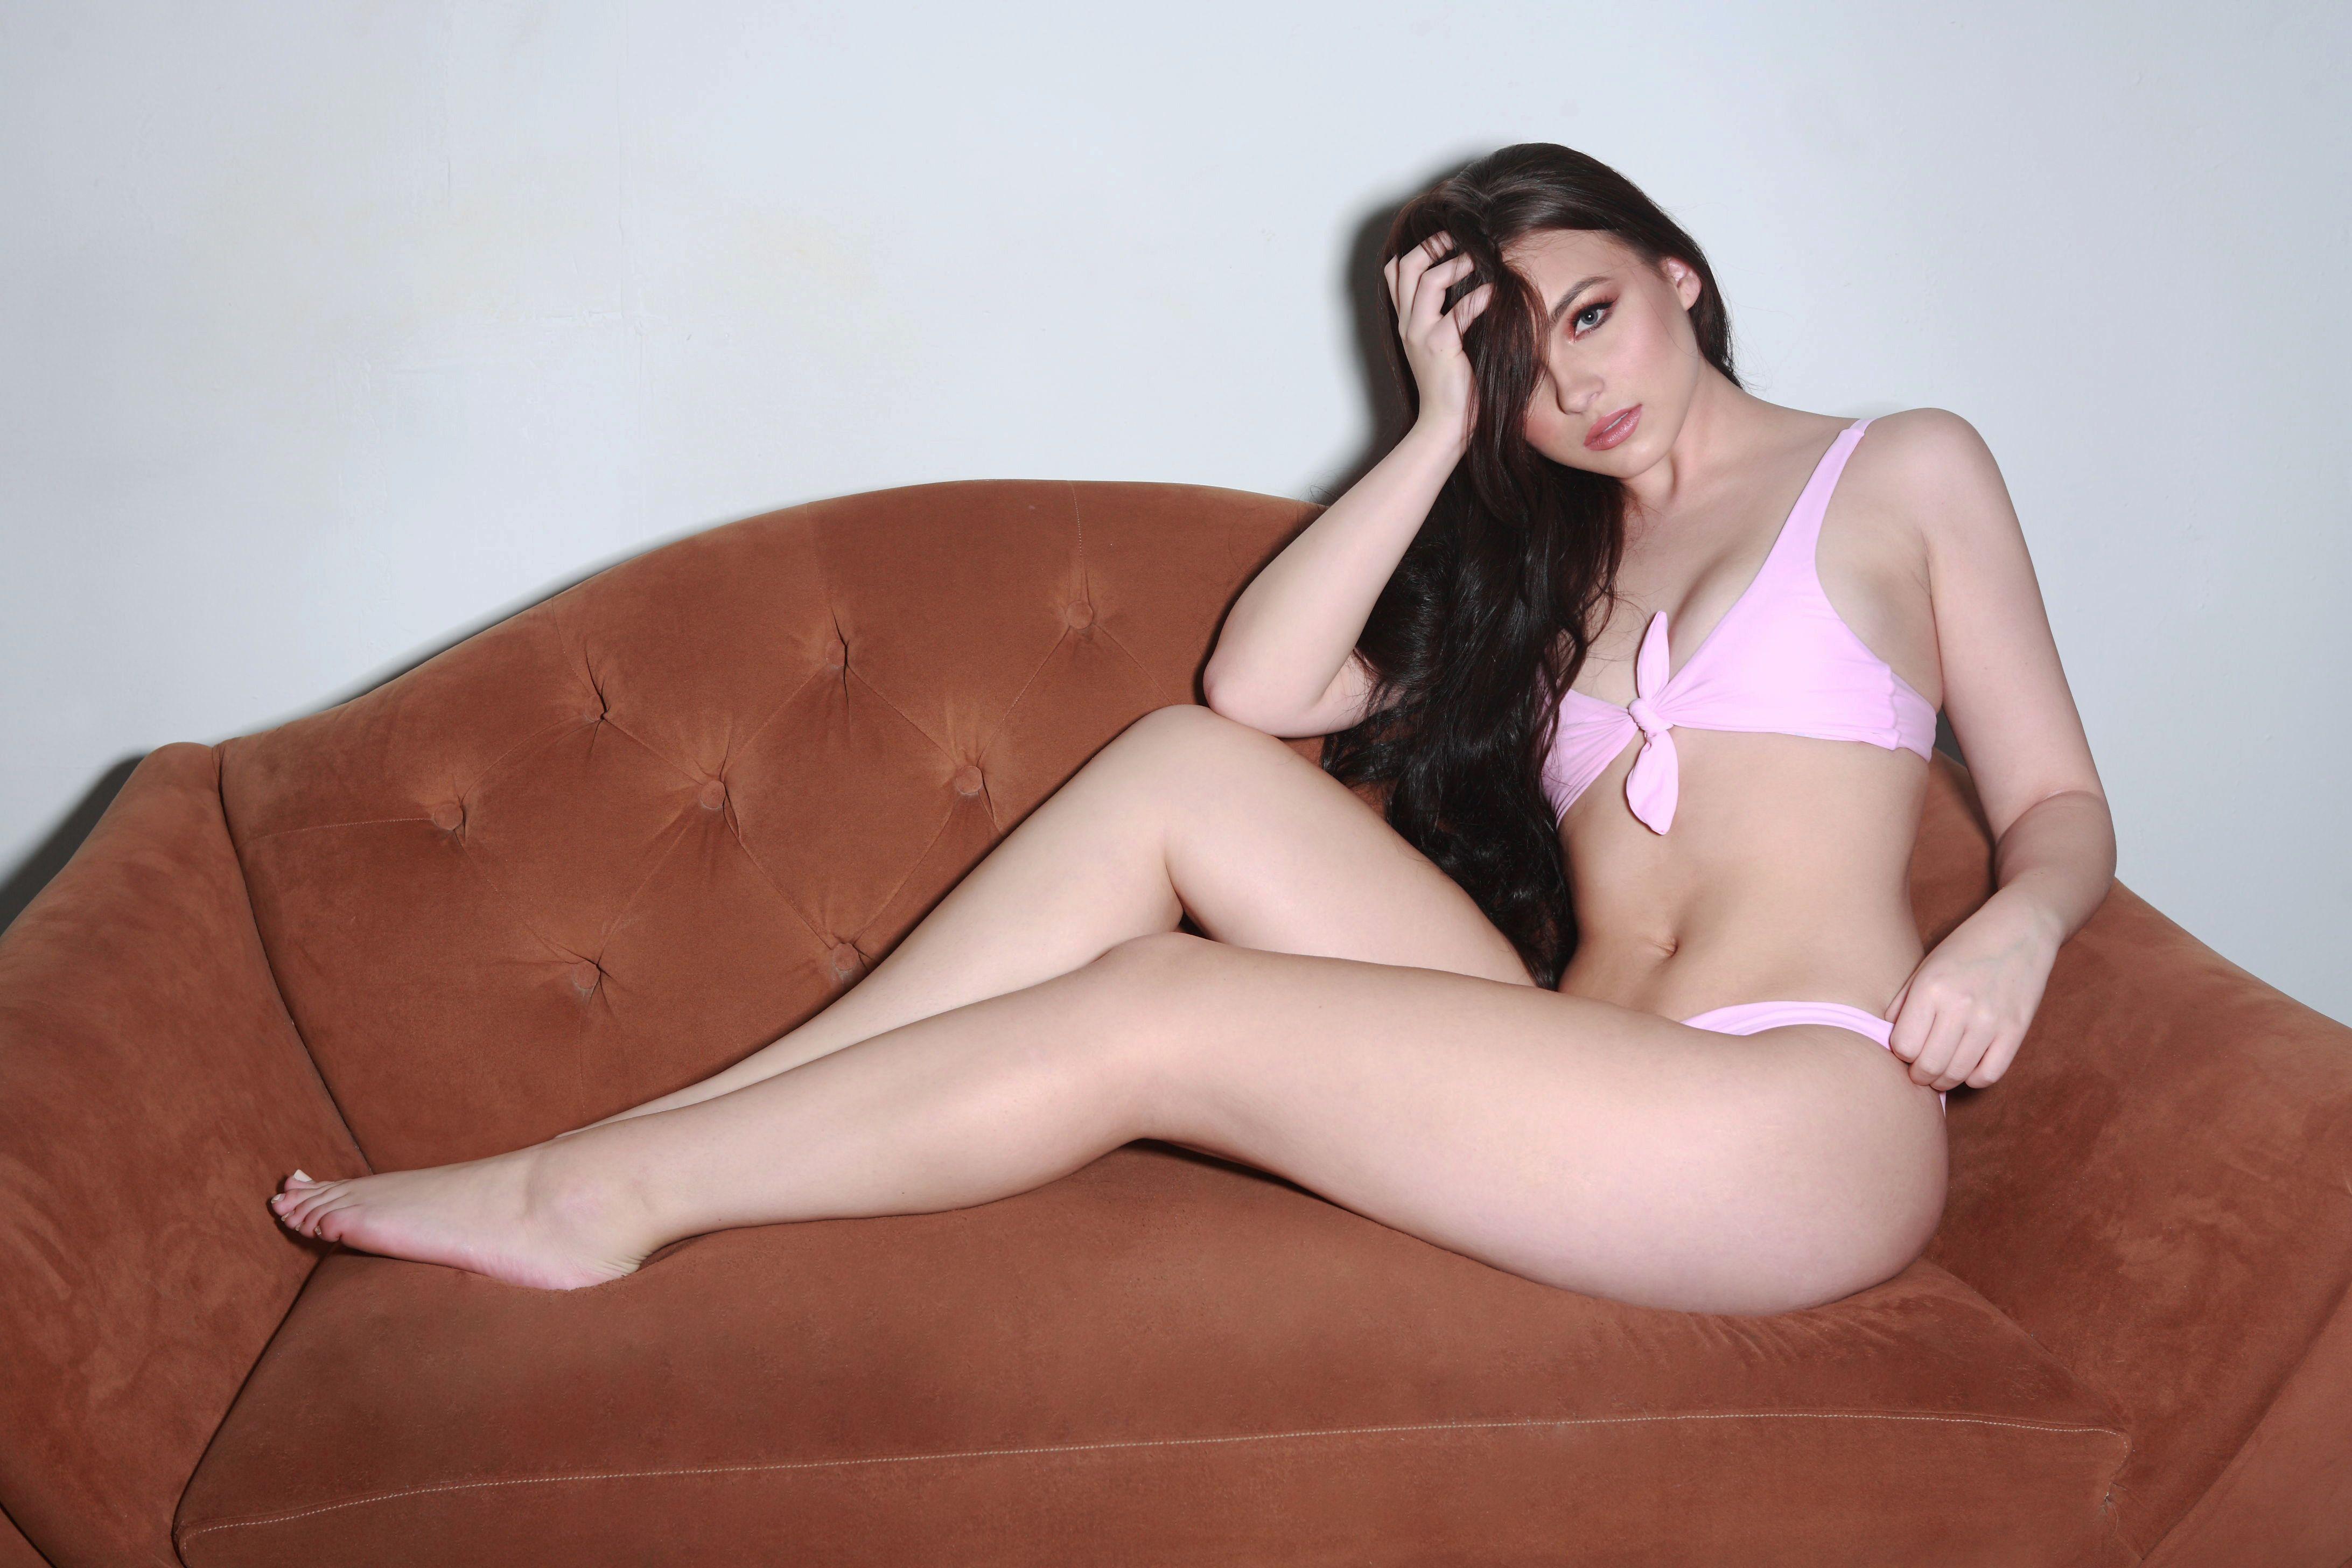 d1d816d07bcf9 7 Best NEW GREATNESS images | Bikini, Summer bikinis, Bikini swimsuit